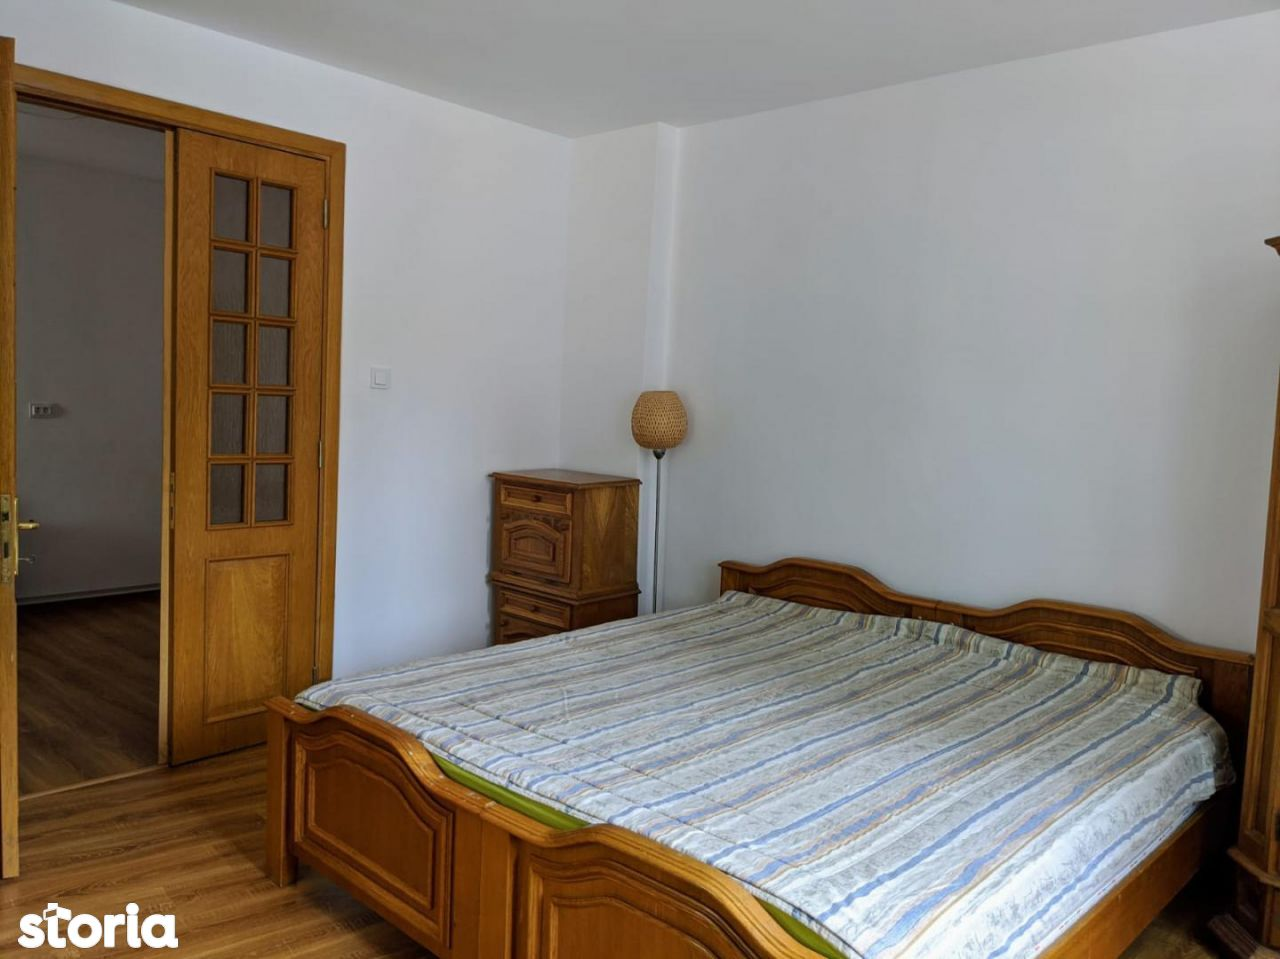 Vanzari Apartamente 2 camere 1 Mai Turda